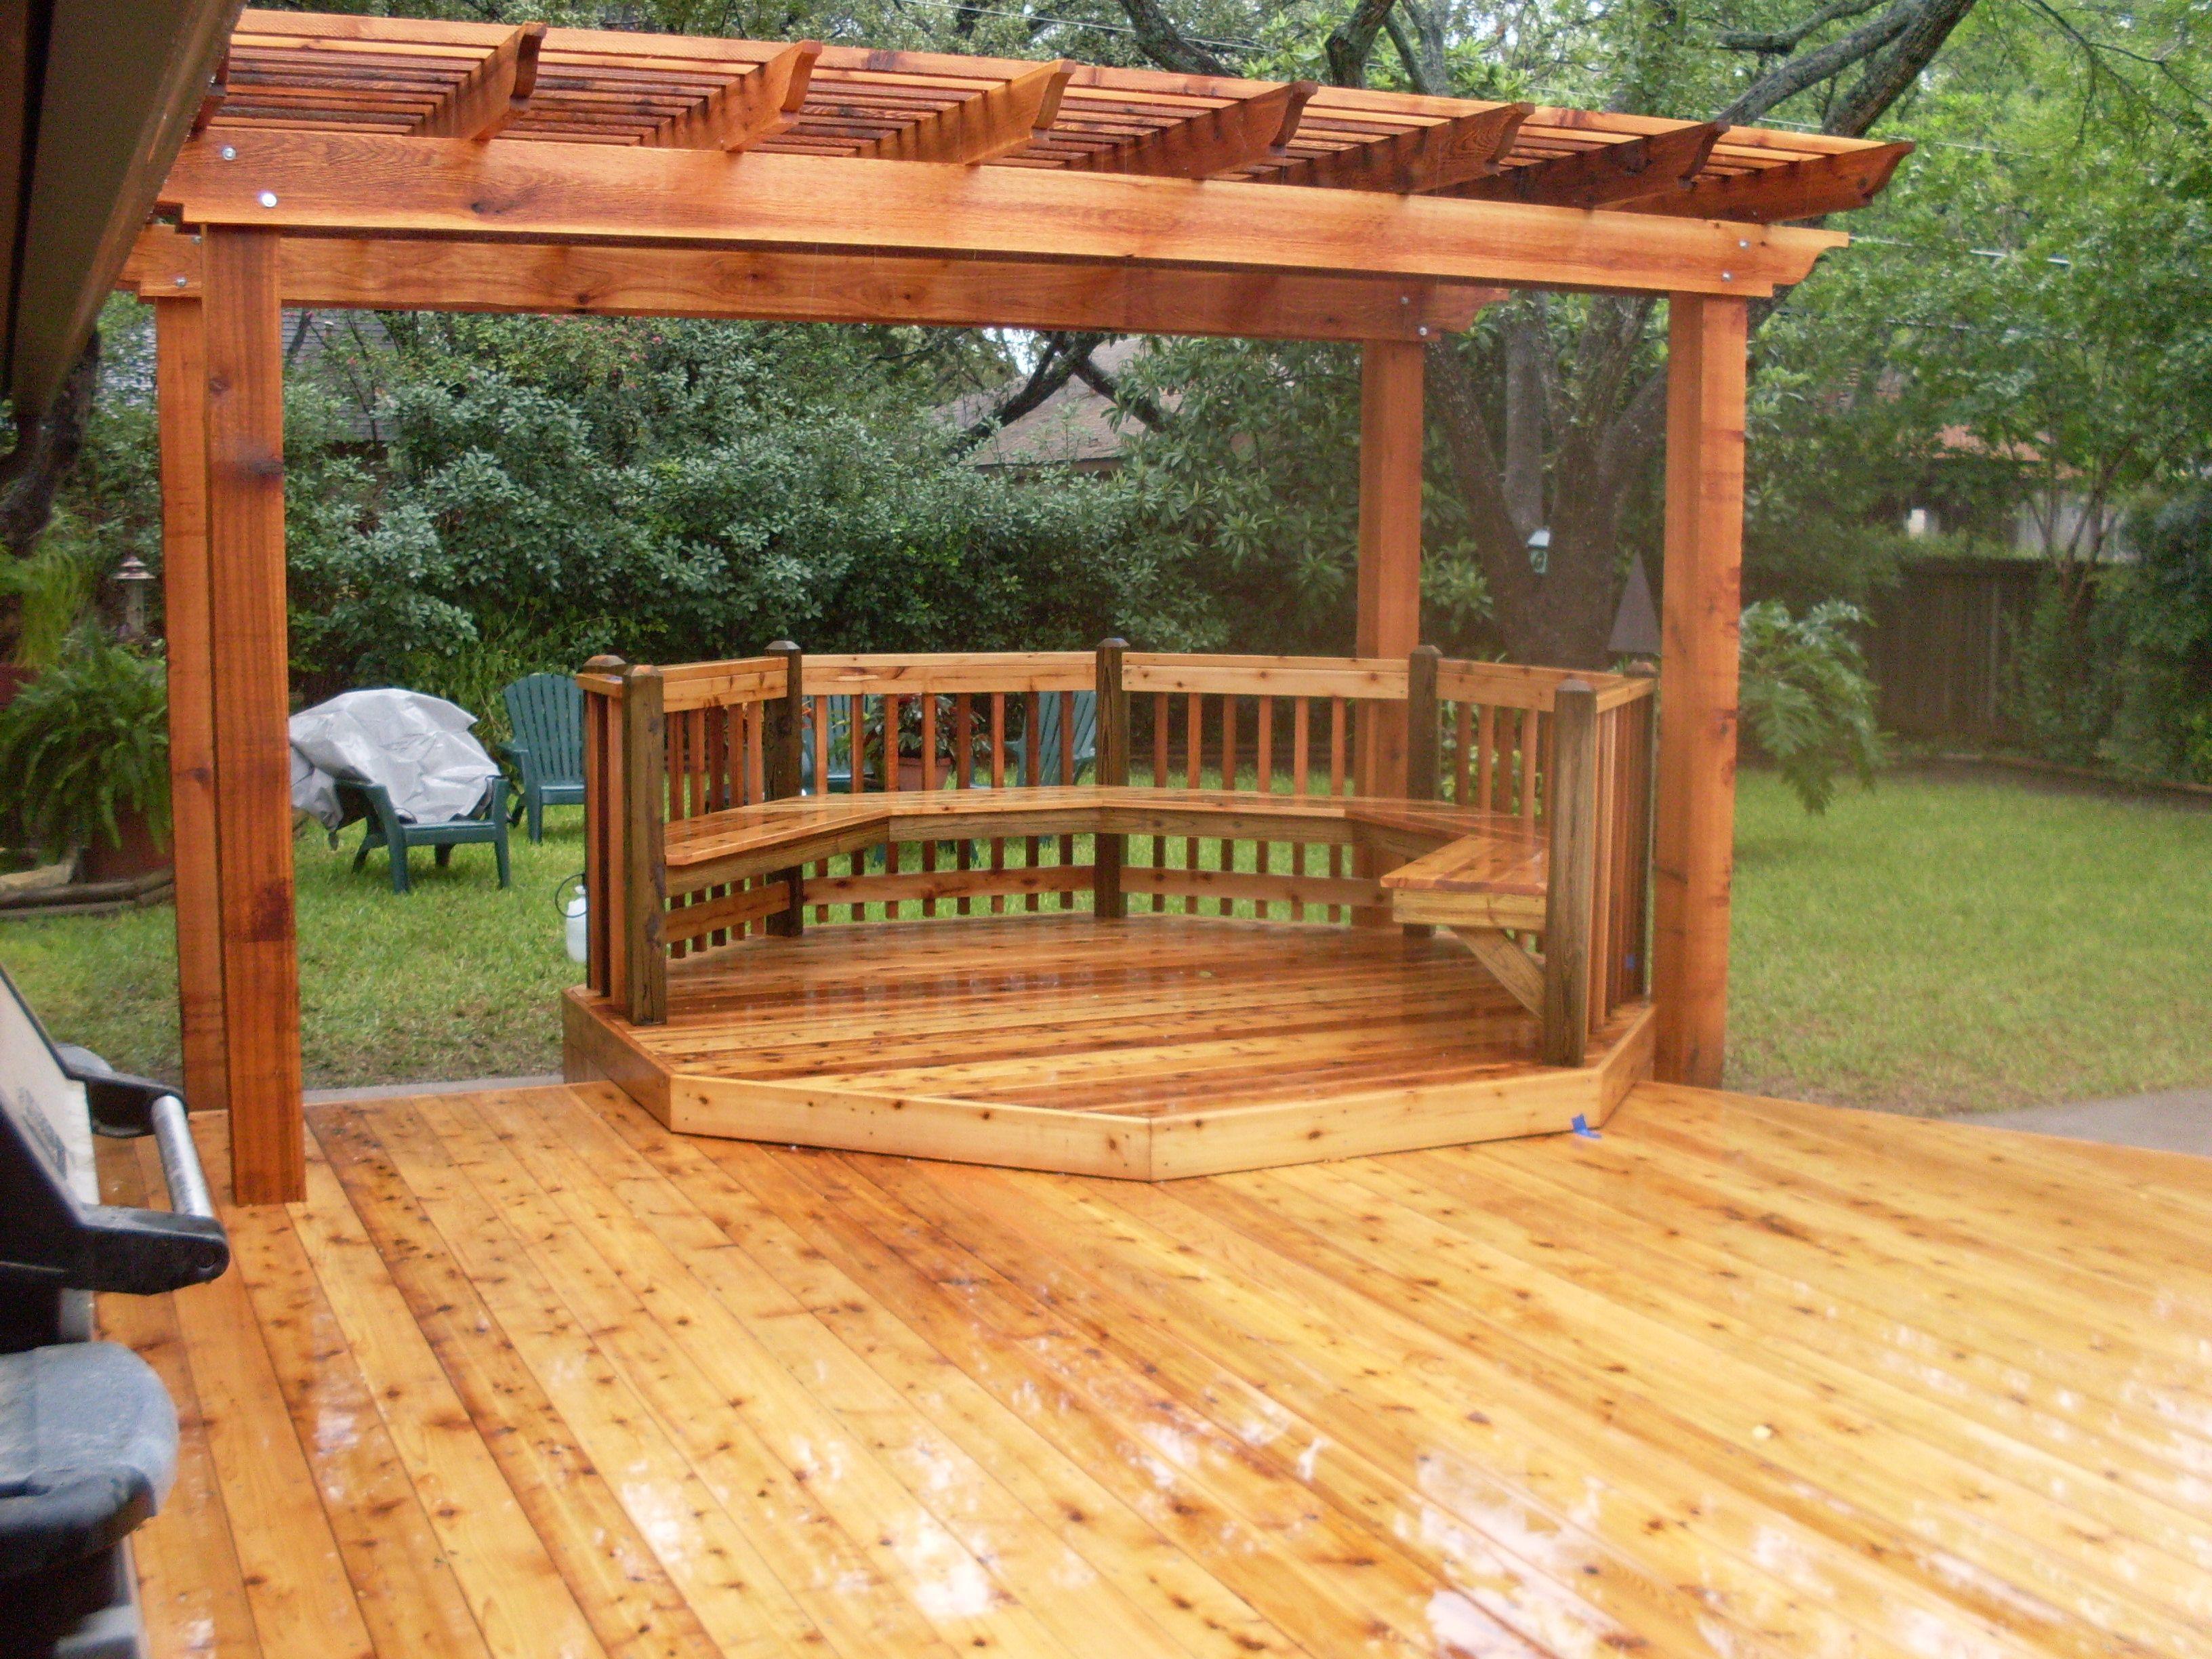 image detail for deck patio designs plans ideas pictures by san